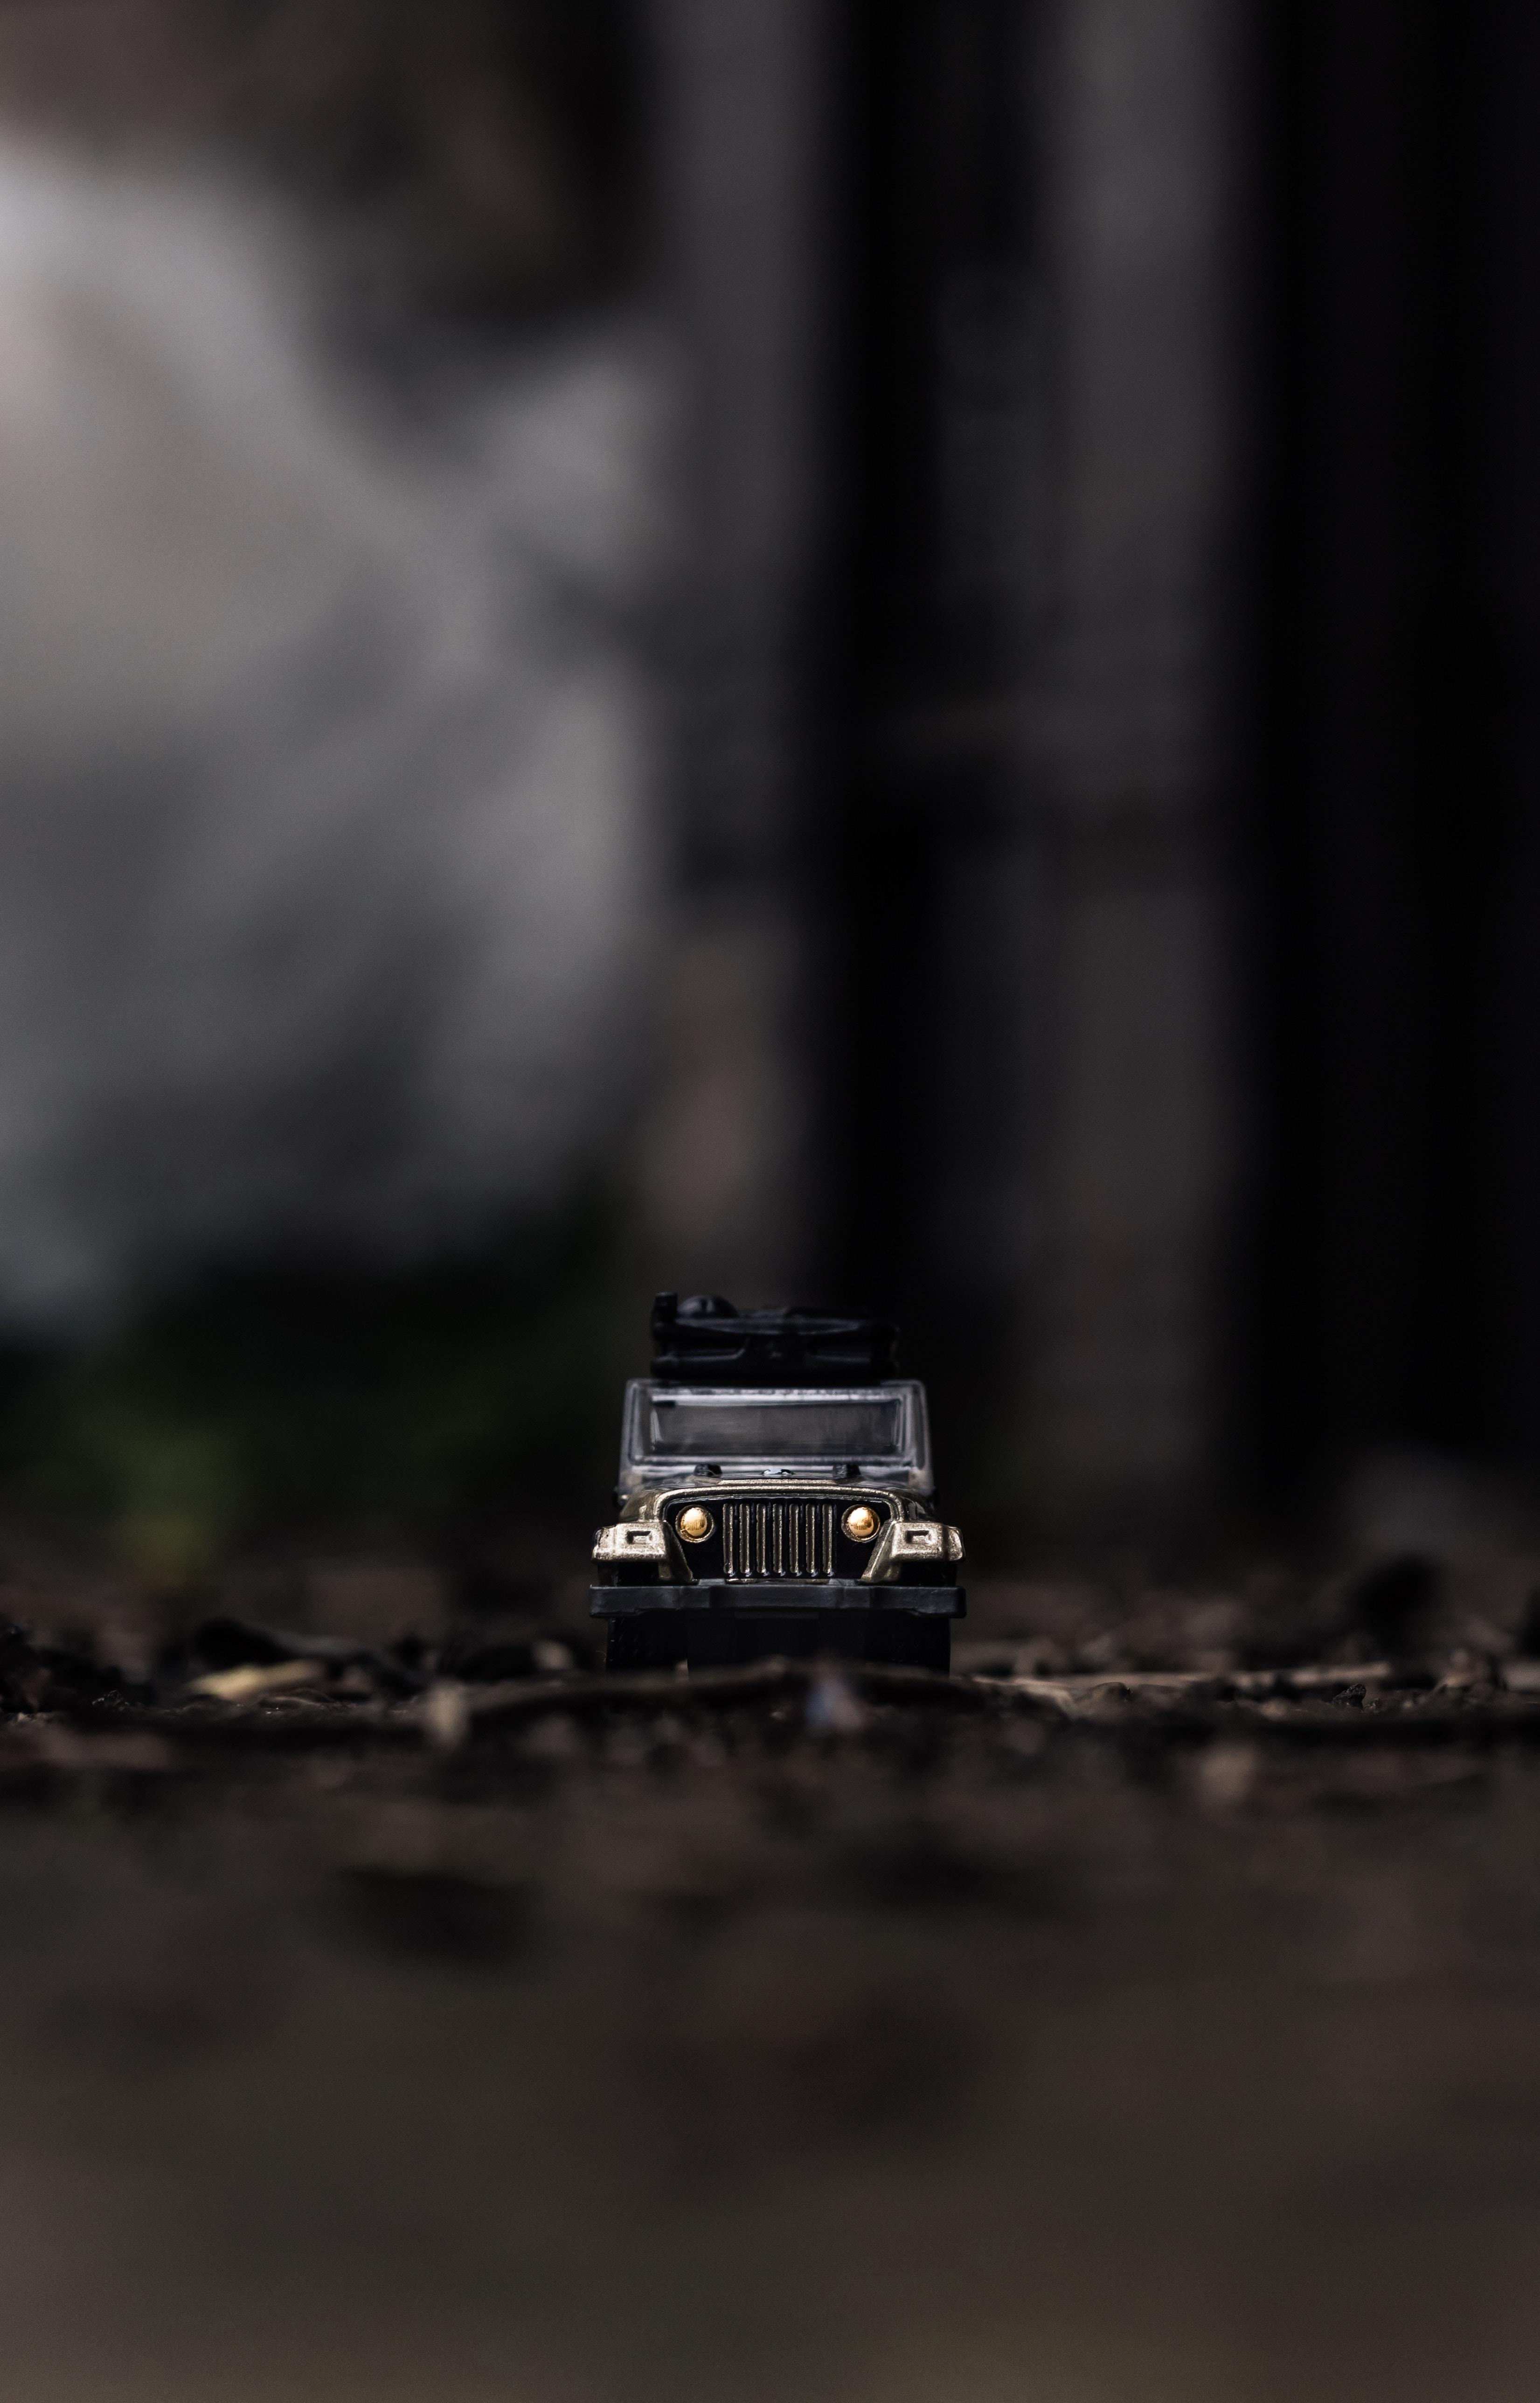 tilt shift lens photography of black Jeep toy